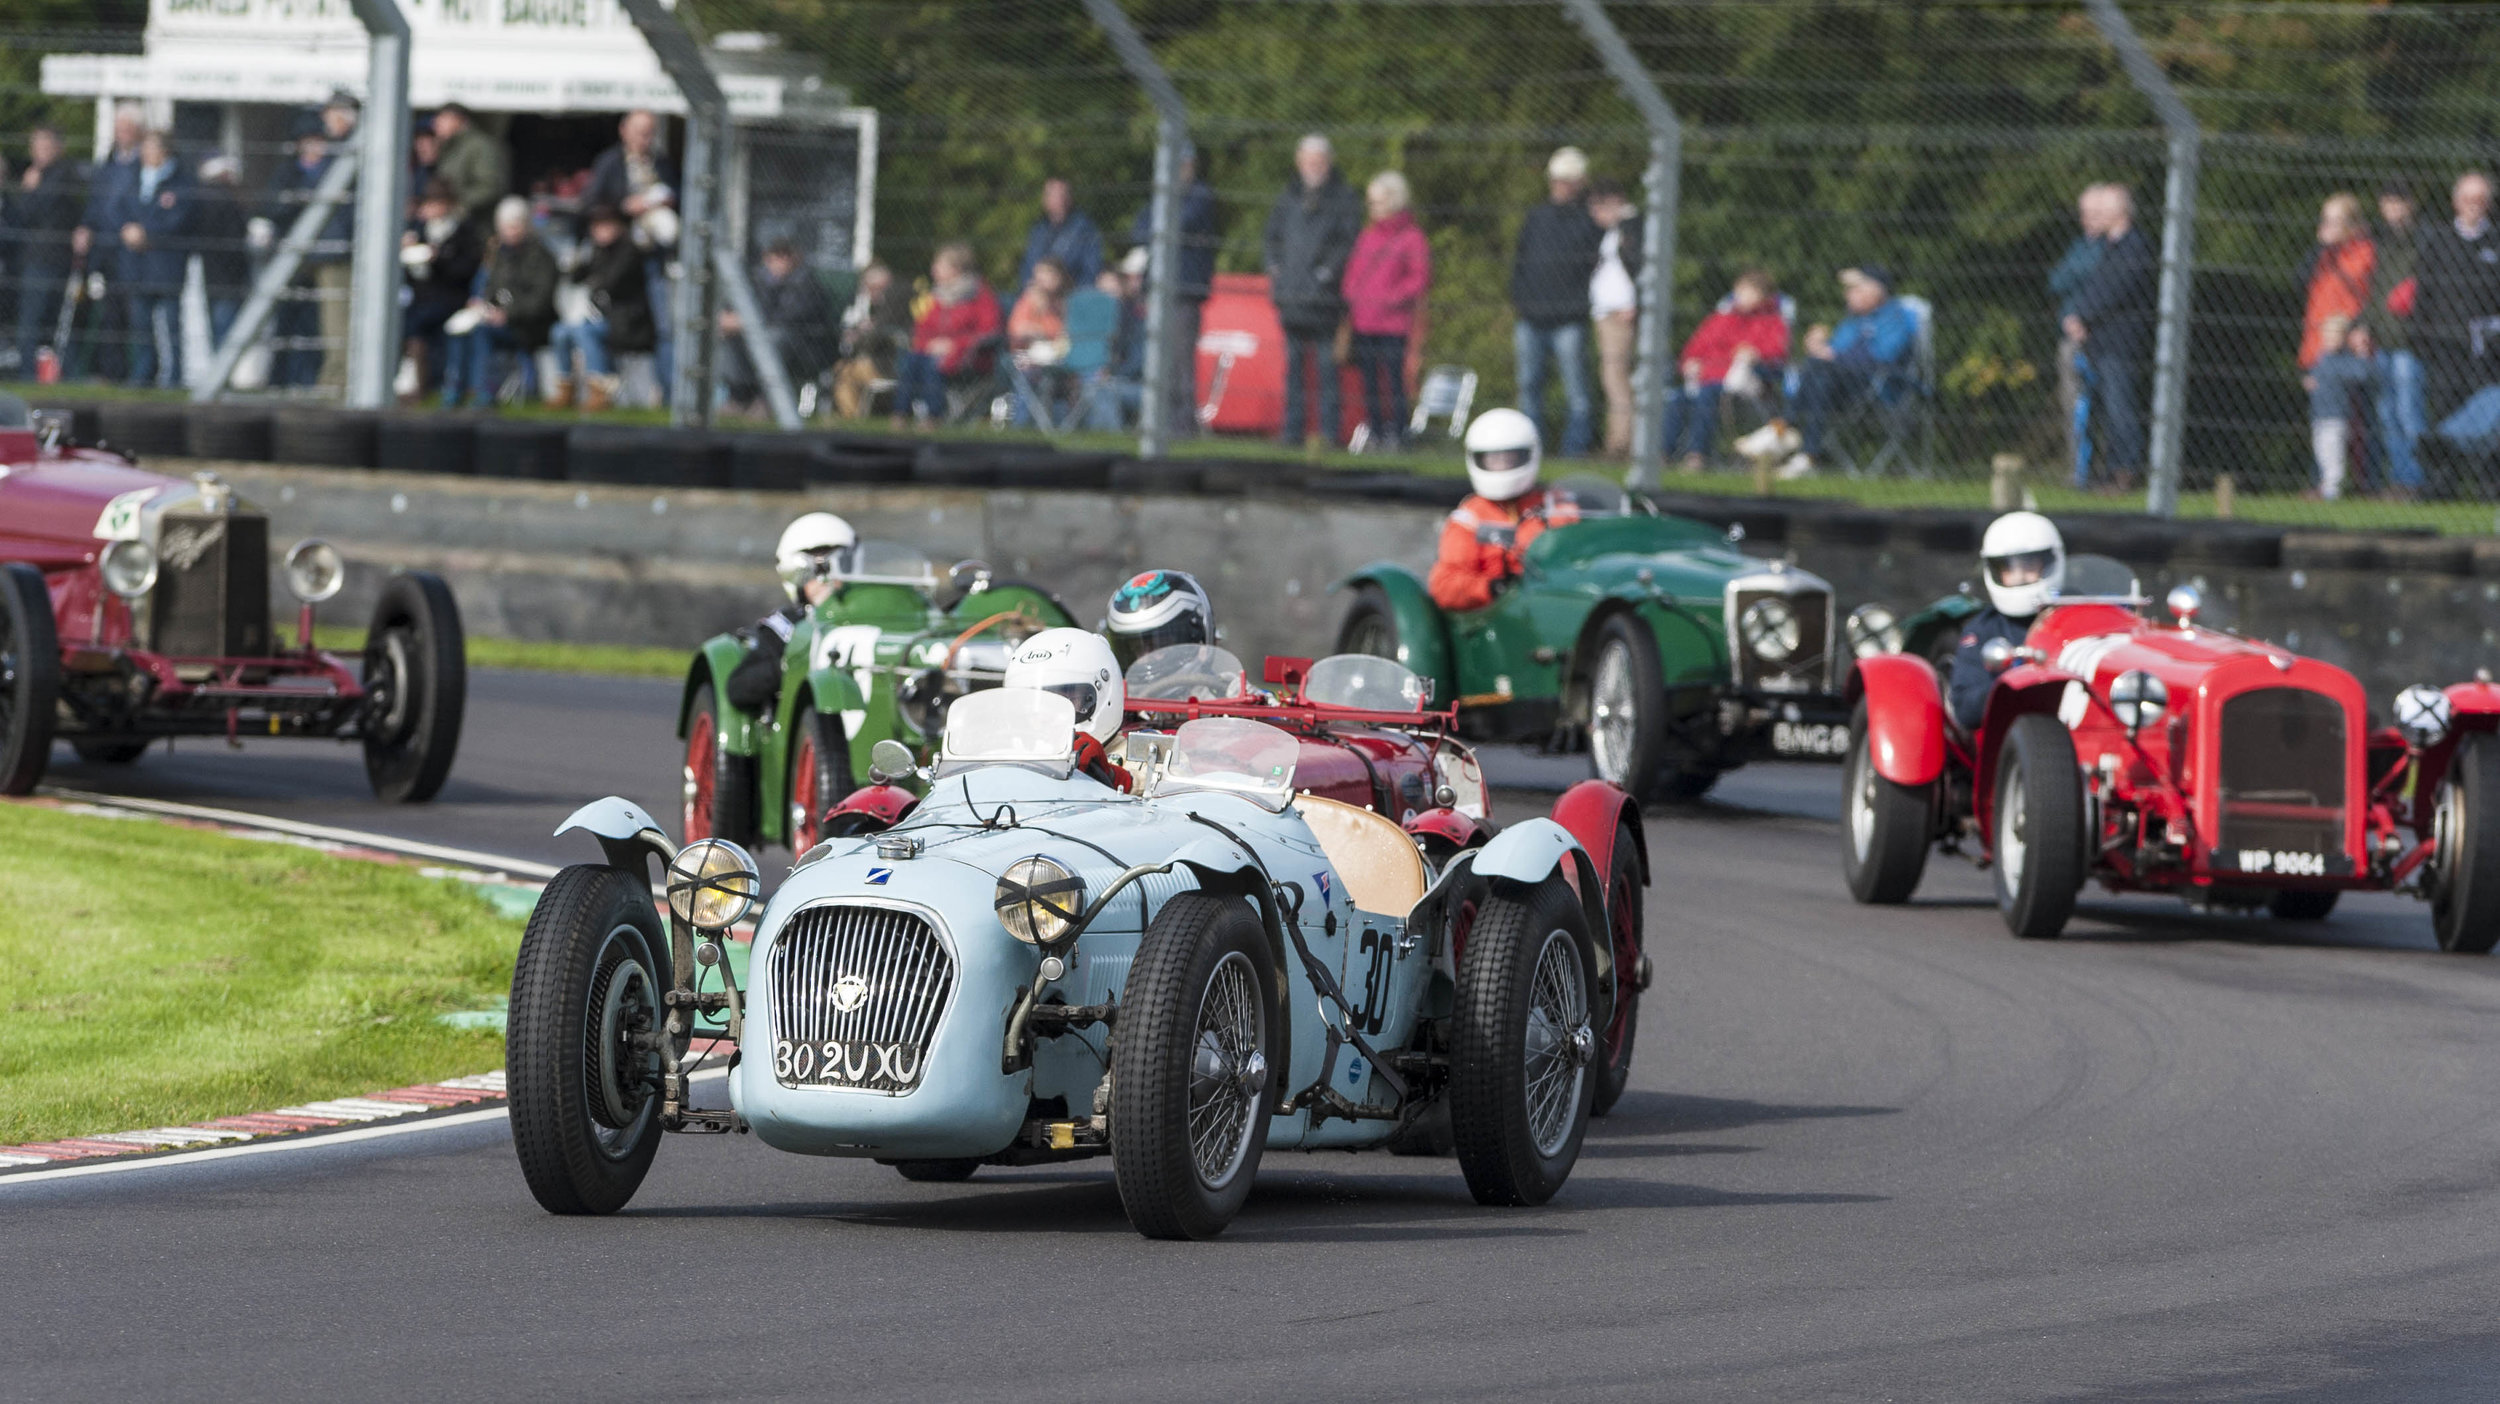 Guyatt in the Talbot Lago heading the pack before succumbing to engine problems:  Peter McFadyen